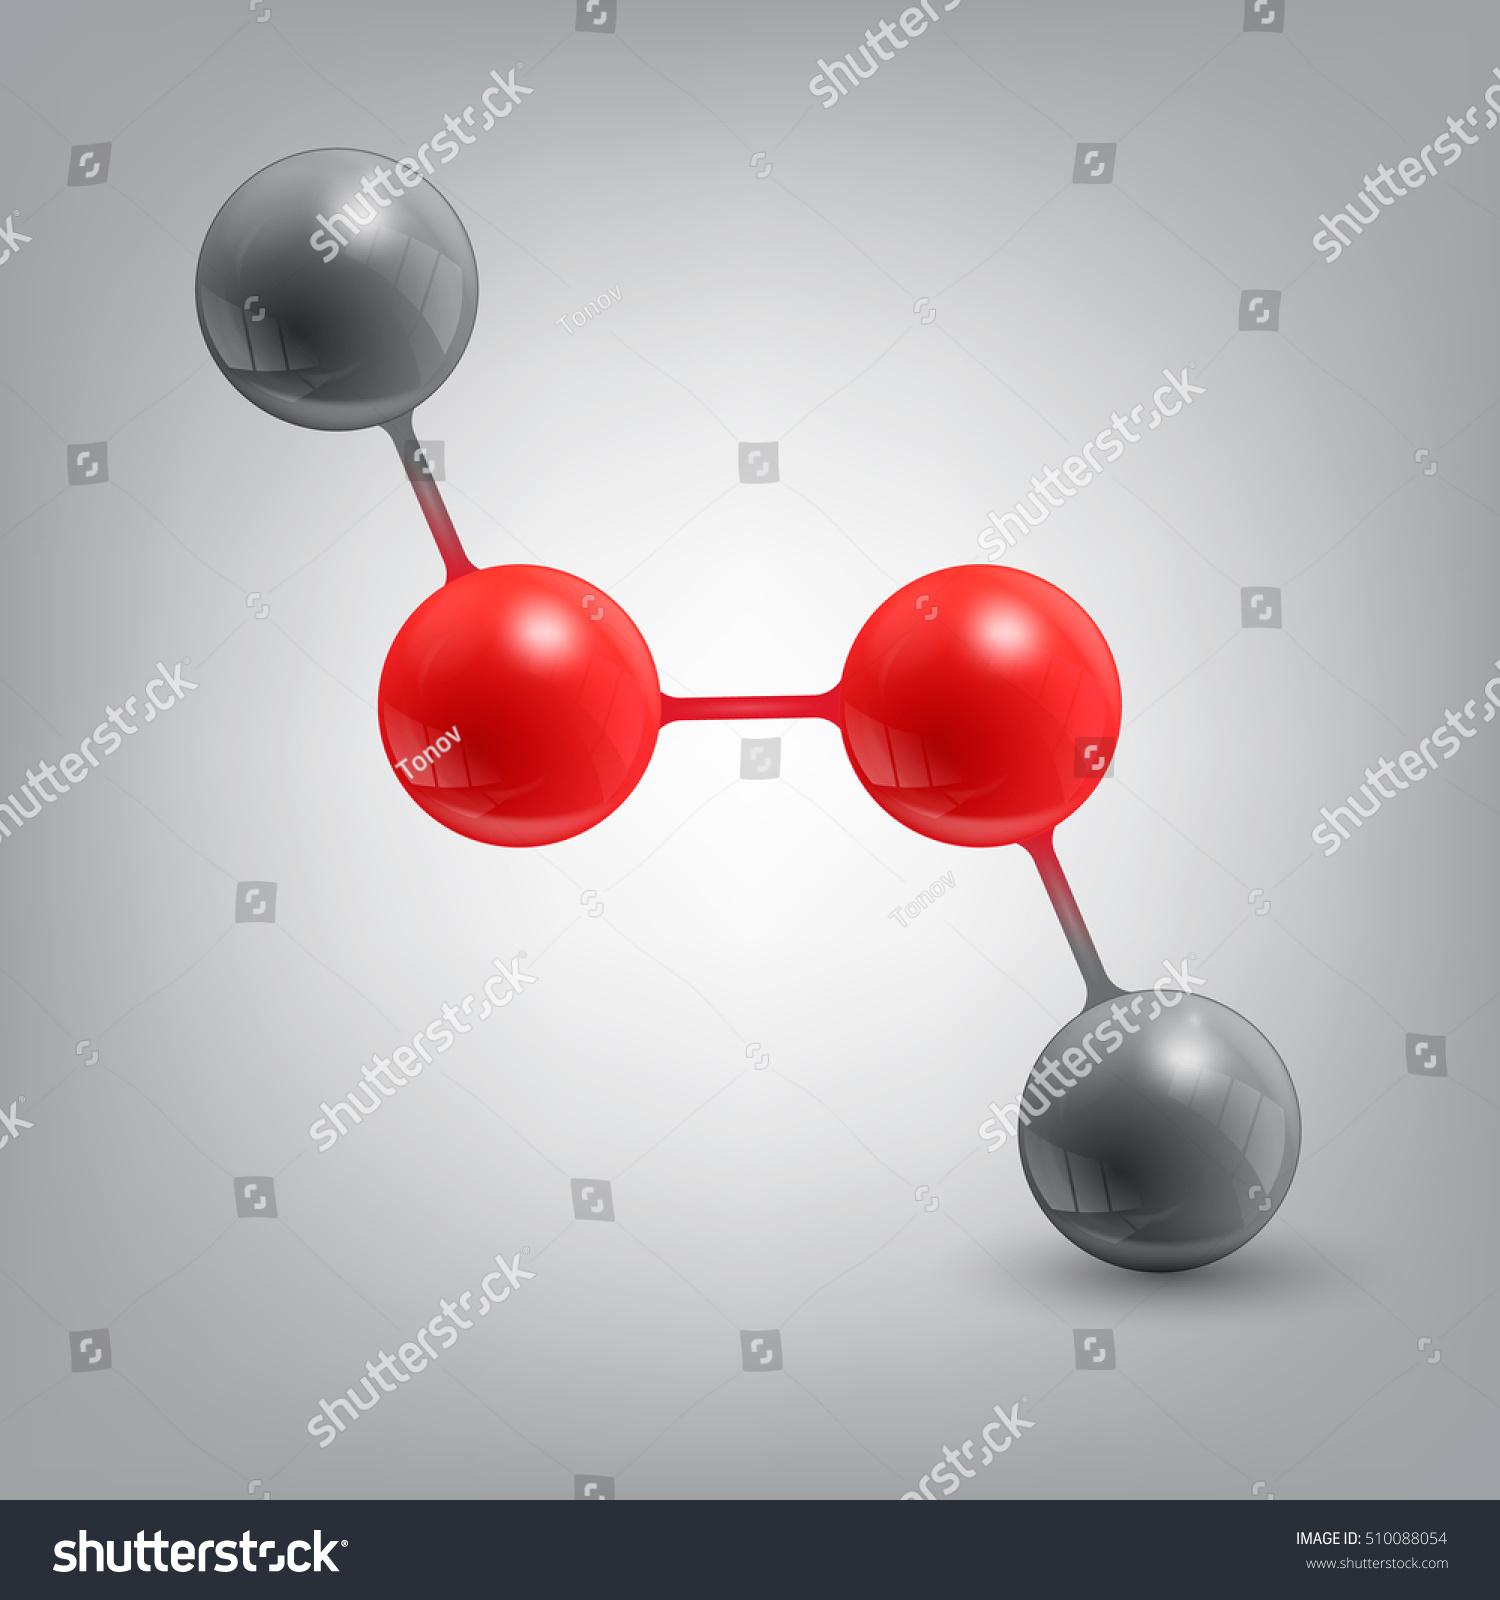 Hydrogen Peroxide Molecule Structure Stock Vector ...